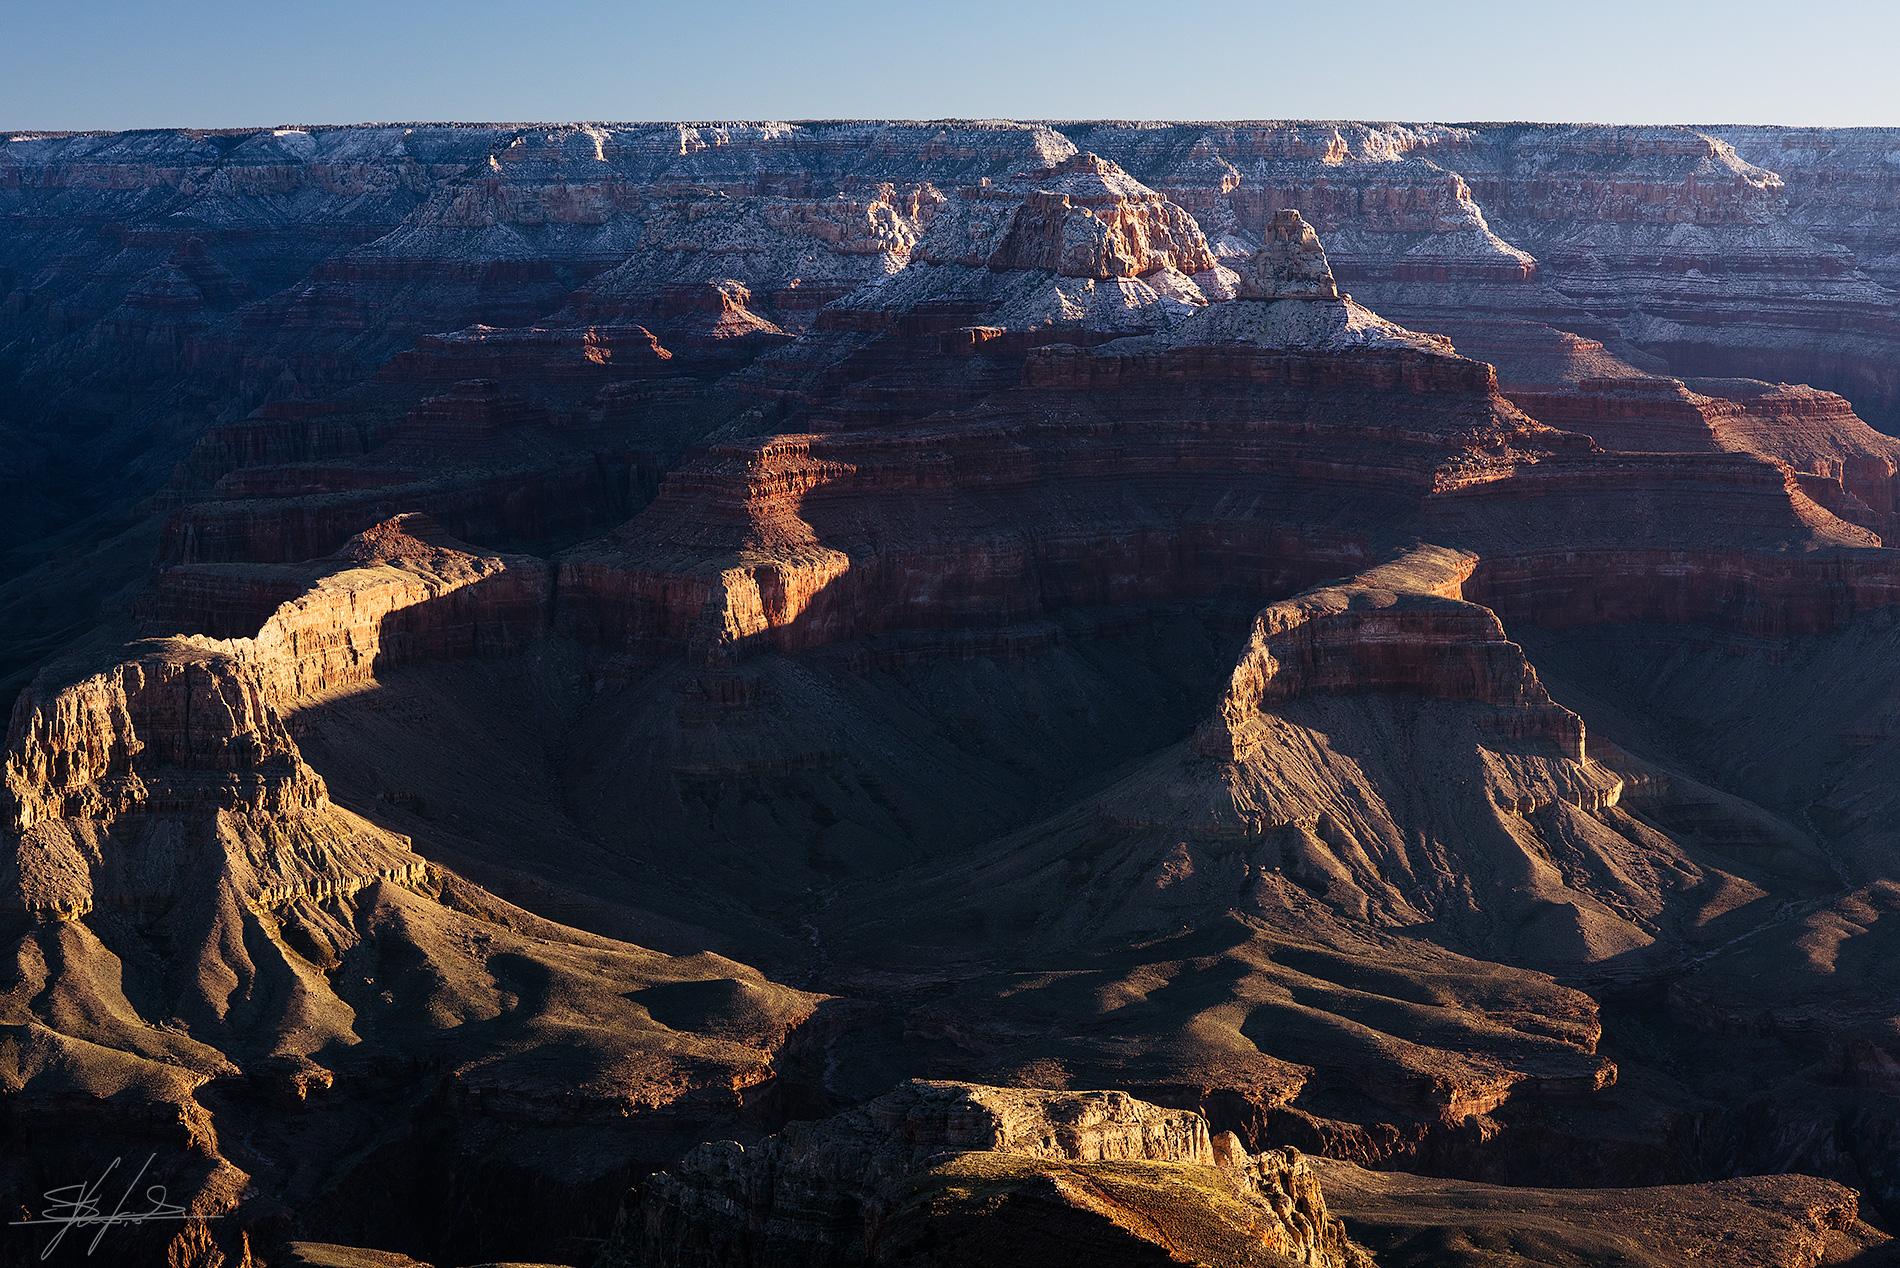 Lights & Shadows upon Gran Canyon